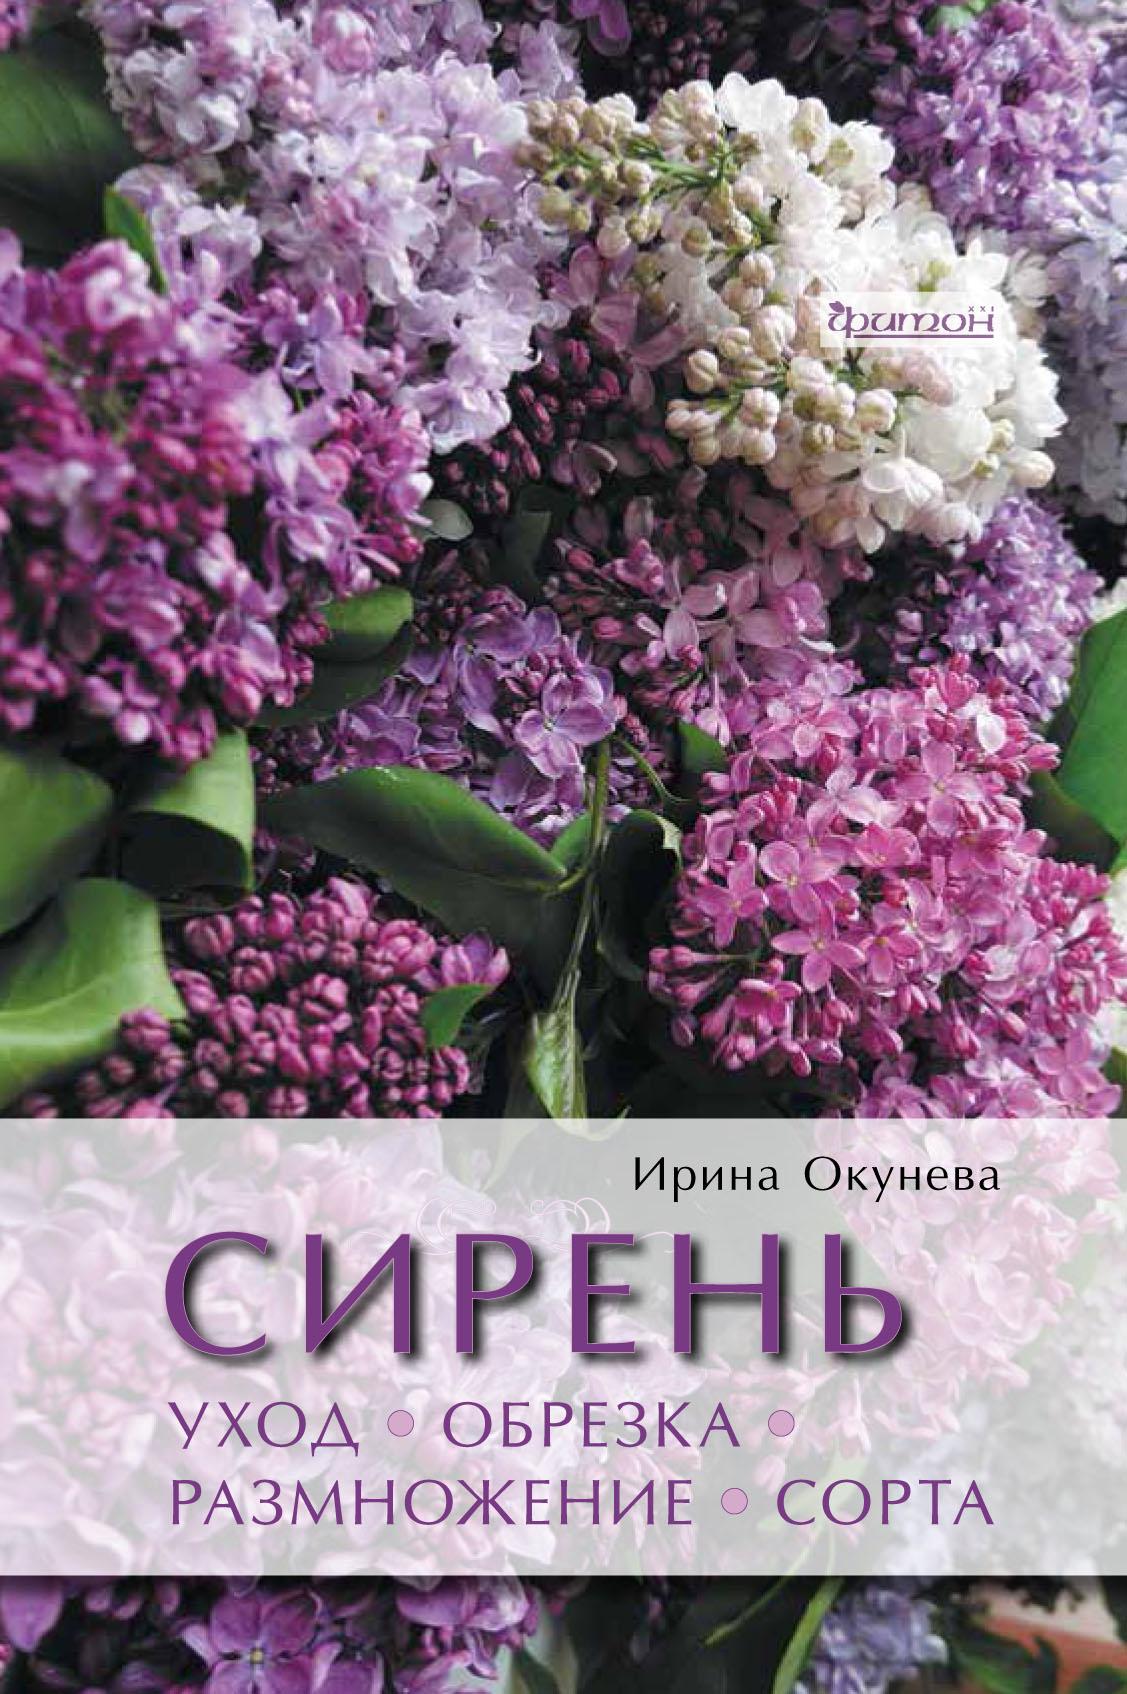 Ирина Окунева / Сирень. Уход, обрезка, размножение, сорта